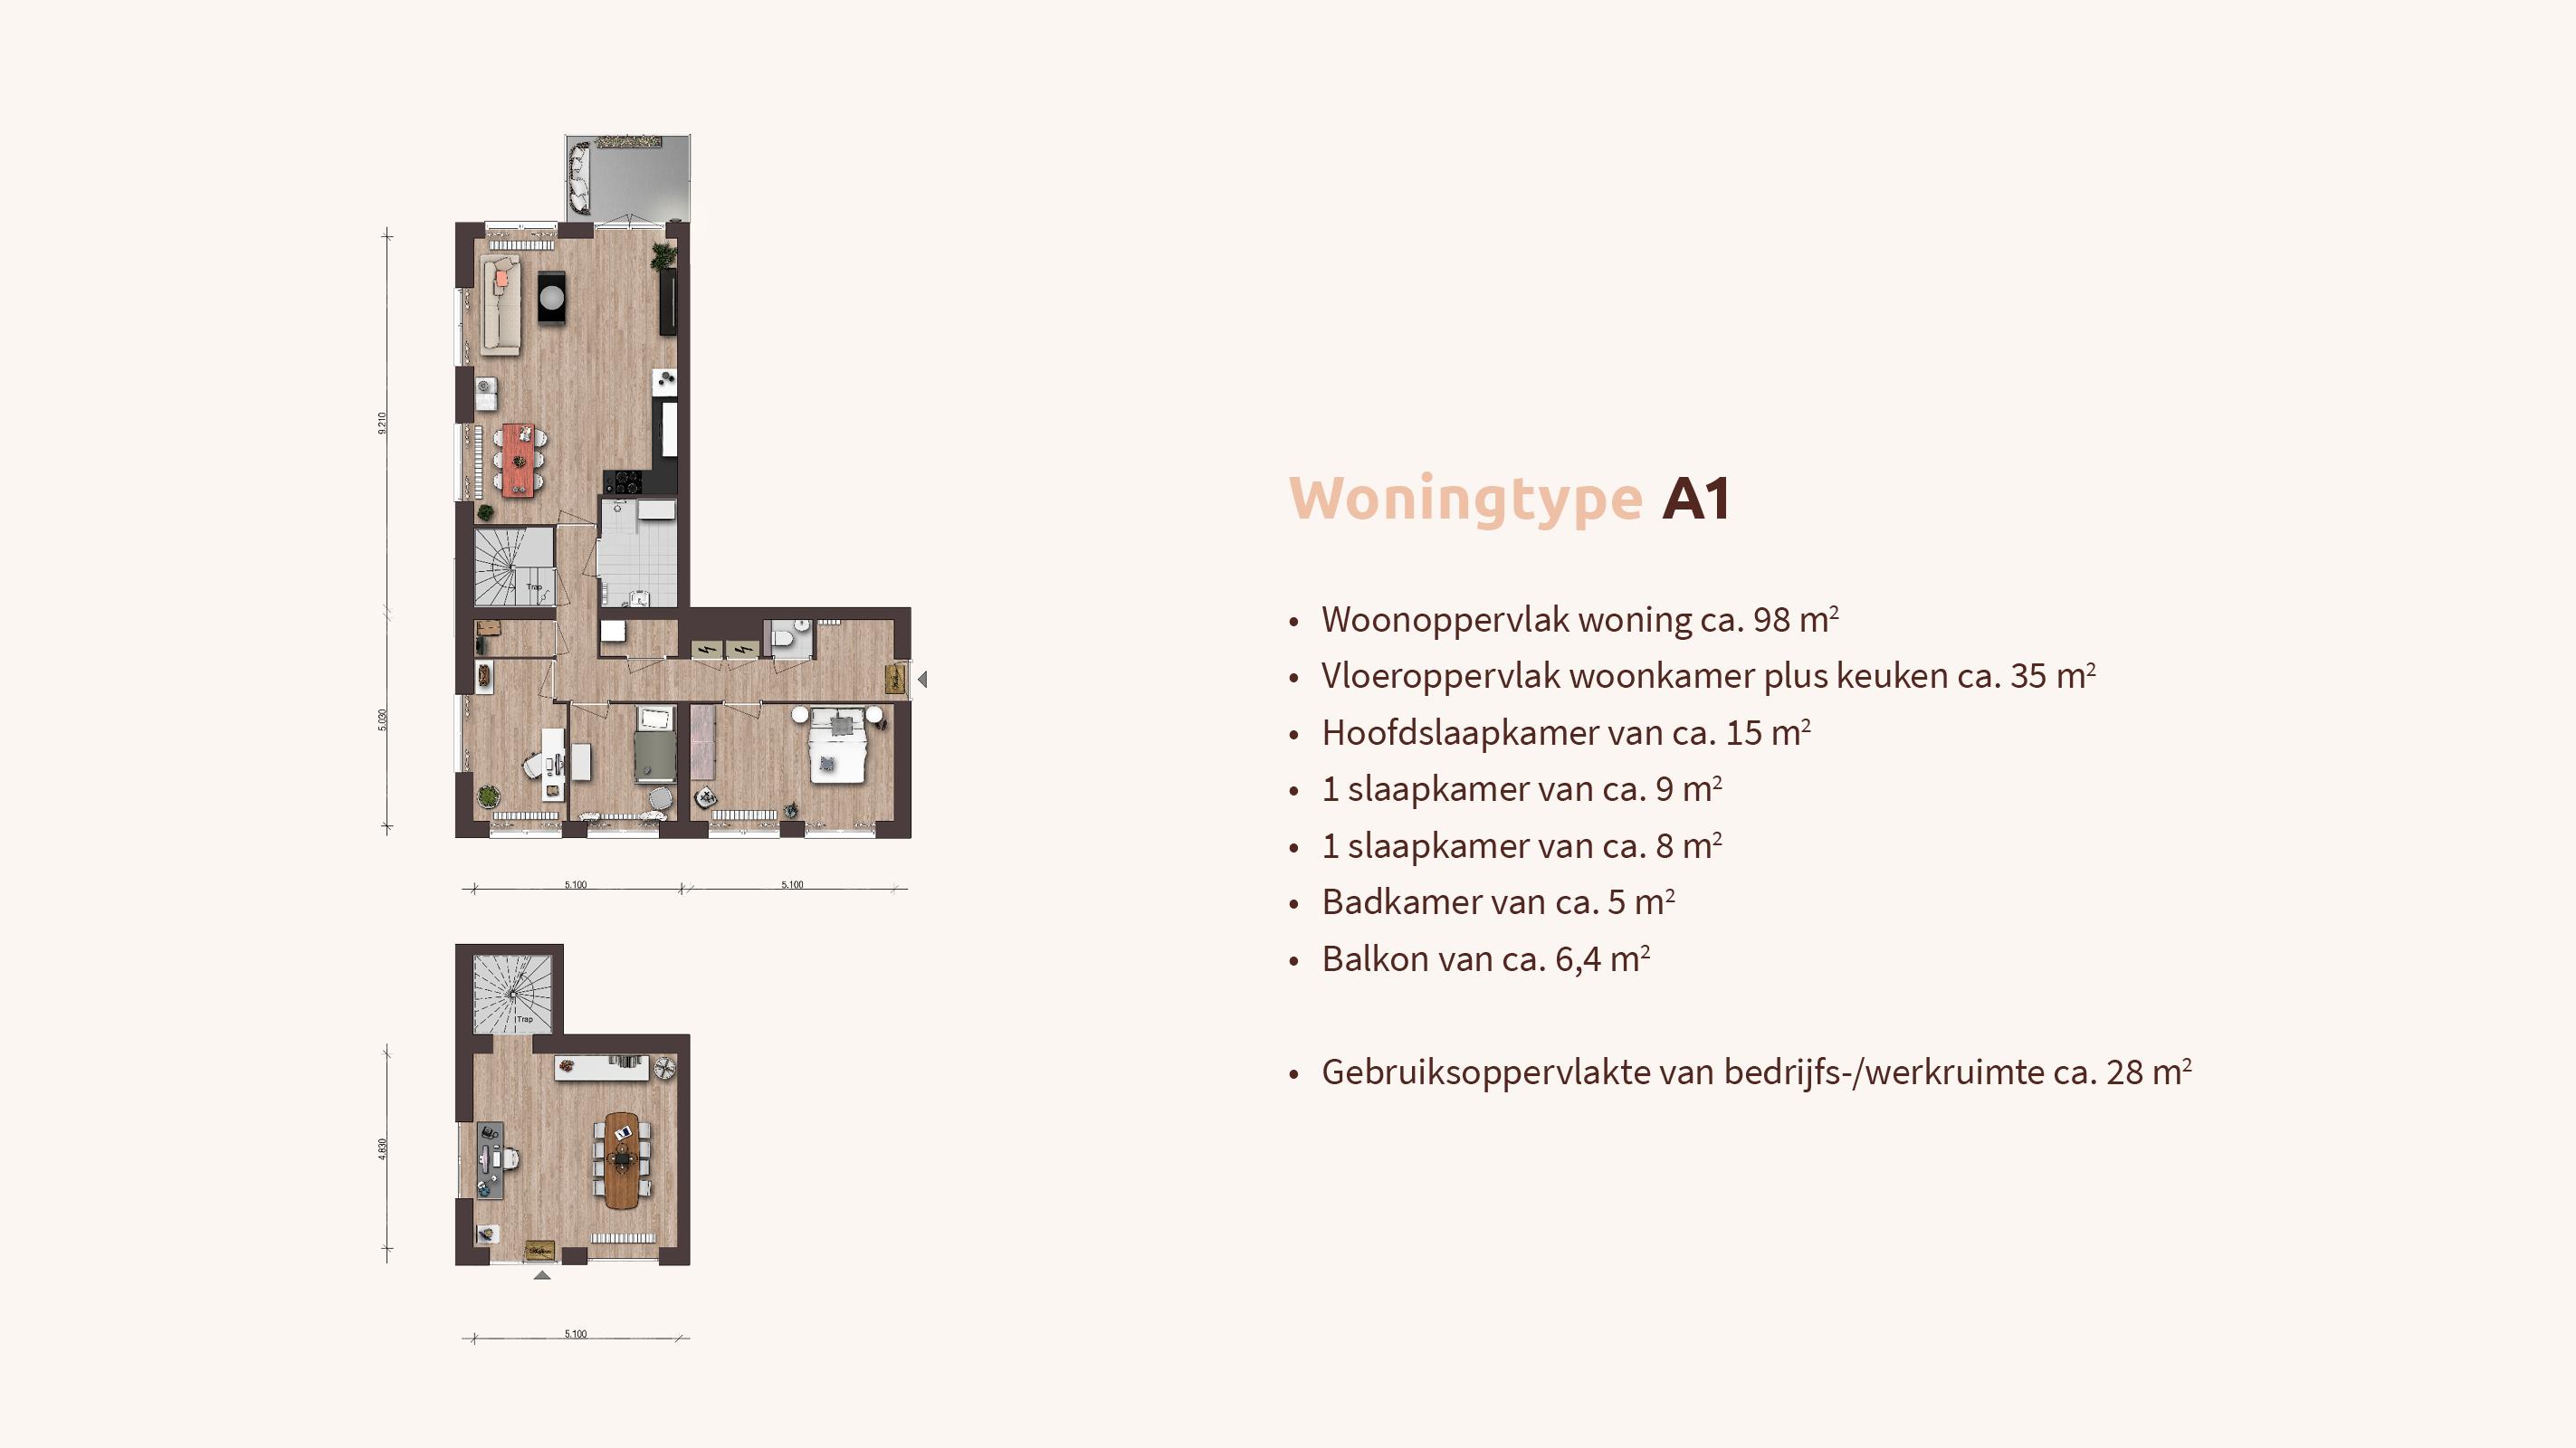 Woningtype - Woon-werk - Plattegrond A1 - Appartementen Leidsche Rijn - Picaz Utrecht